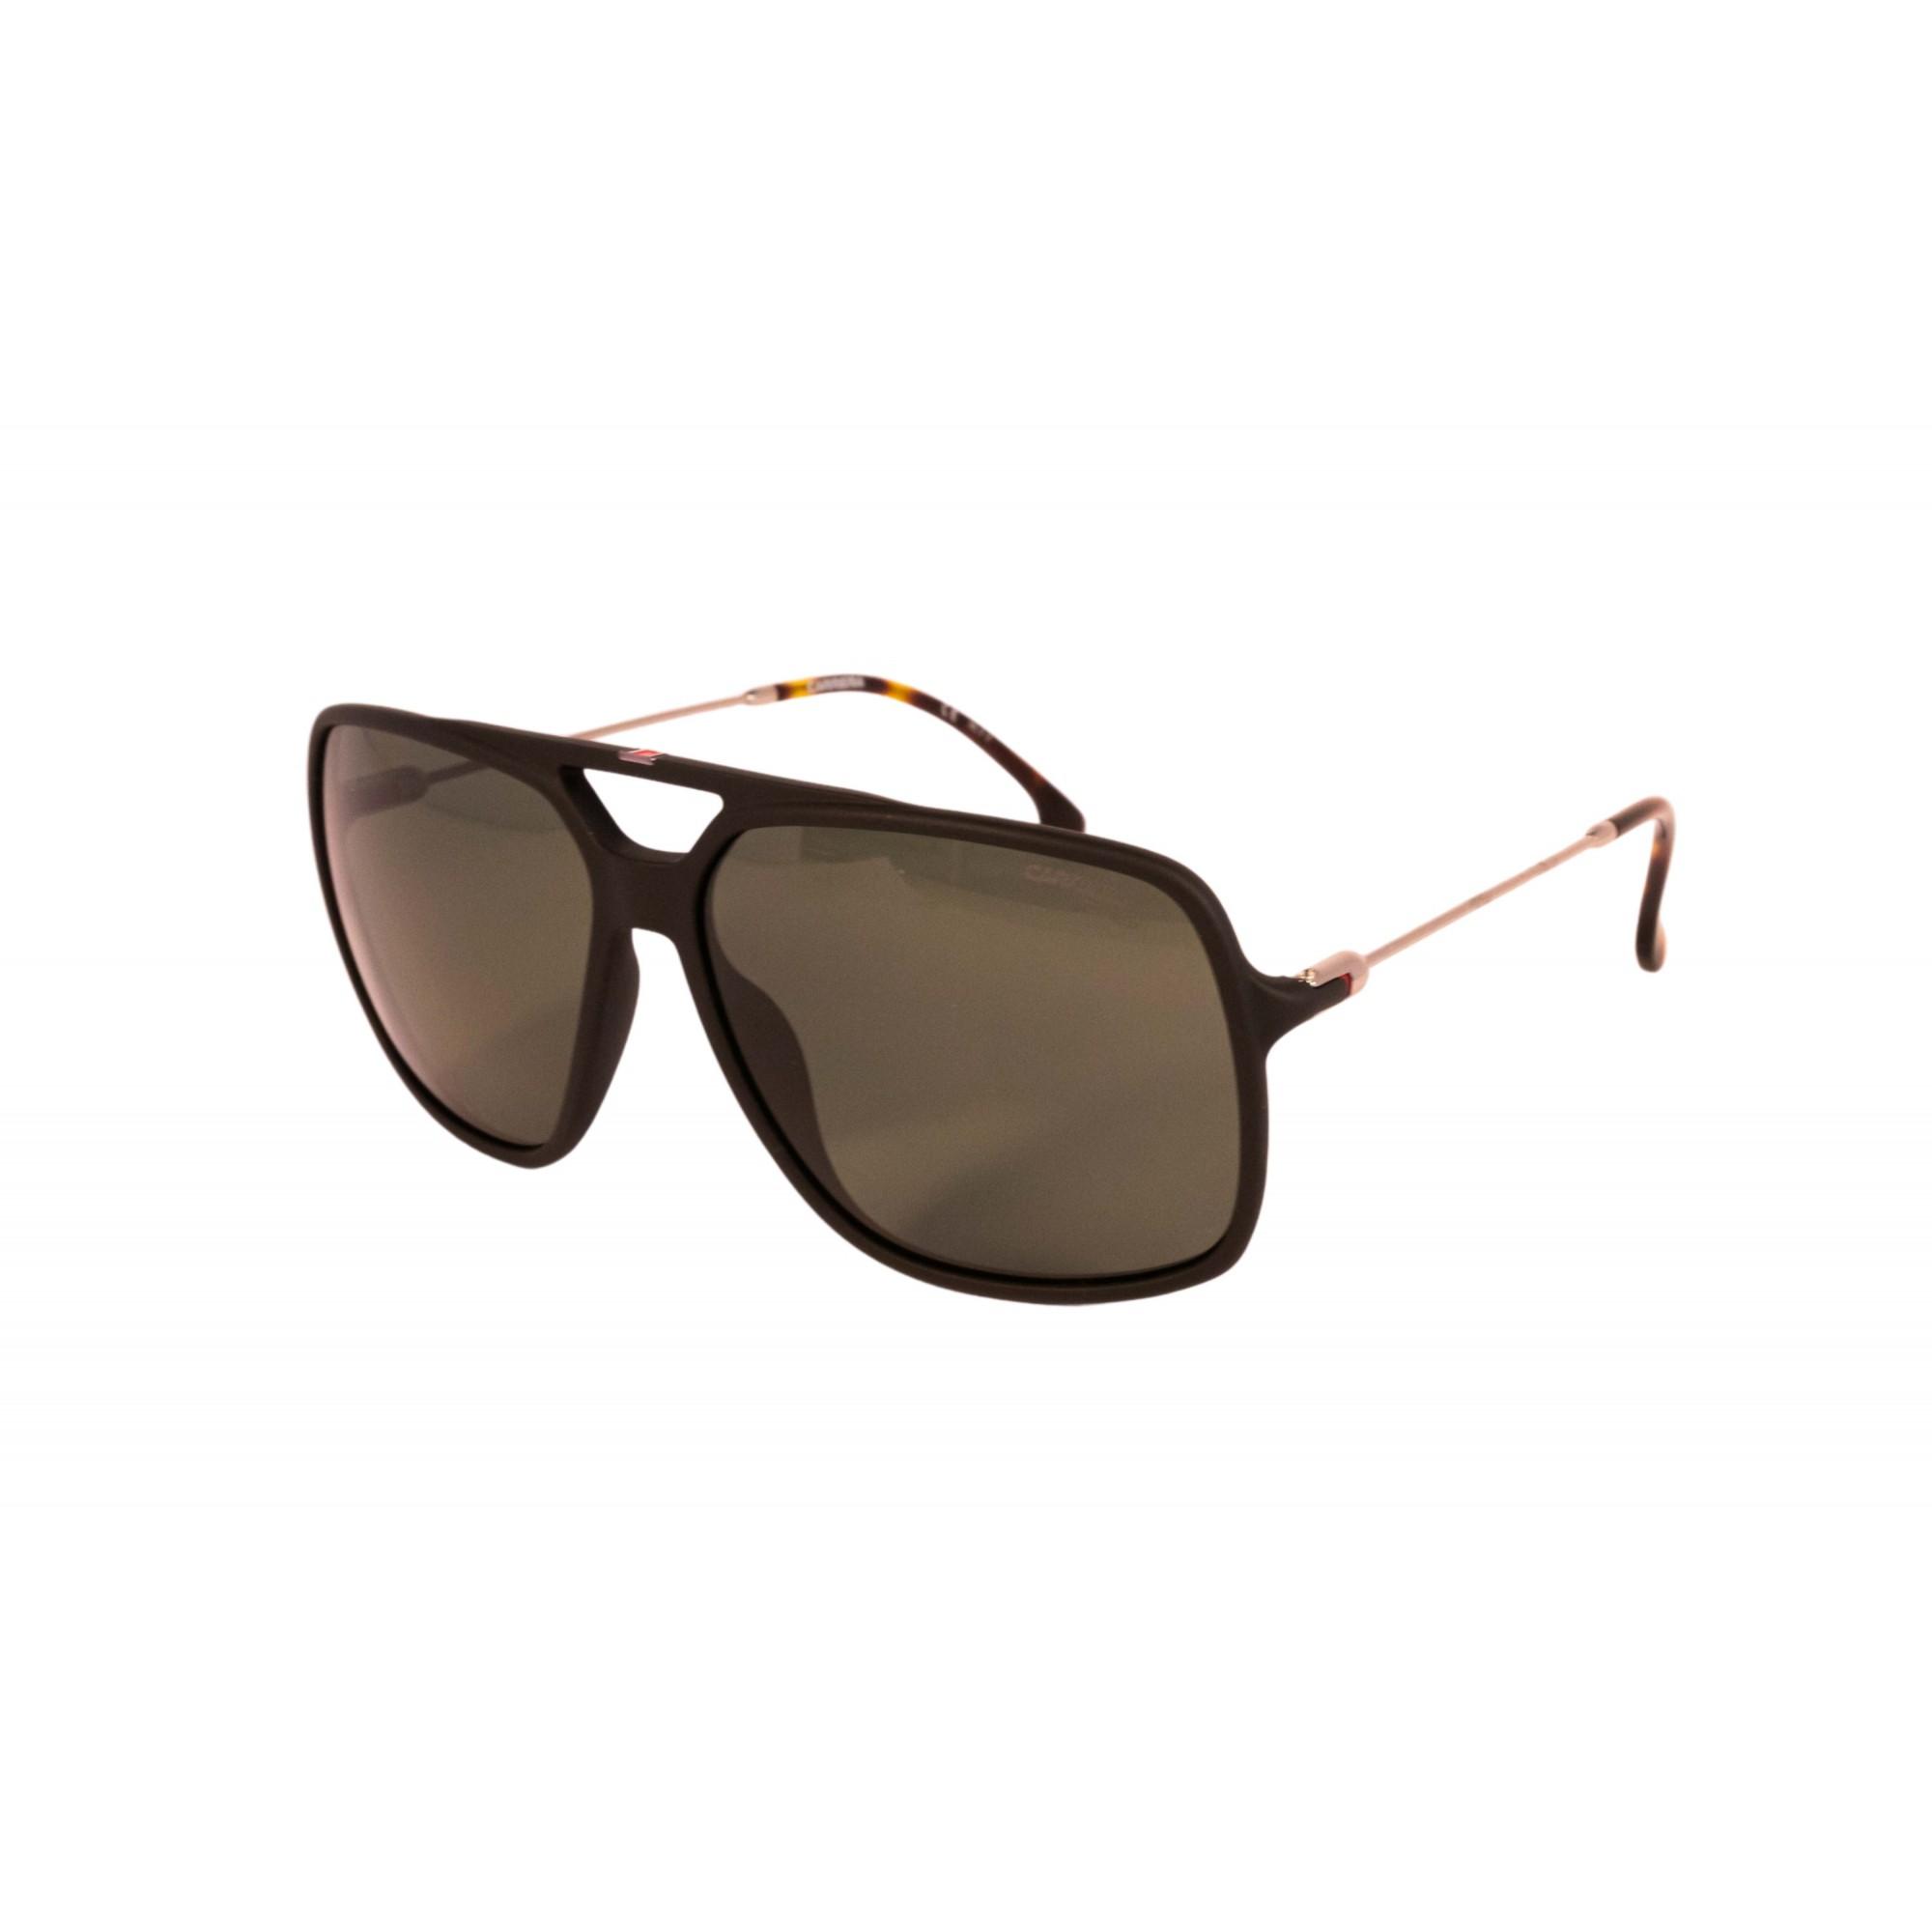 Óculos Carrera hexagonal ca155s 003uc 62 Tartaruga